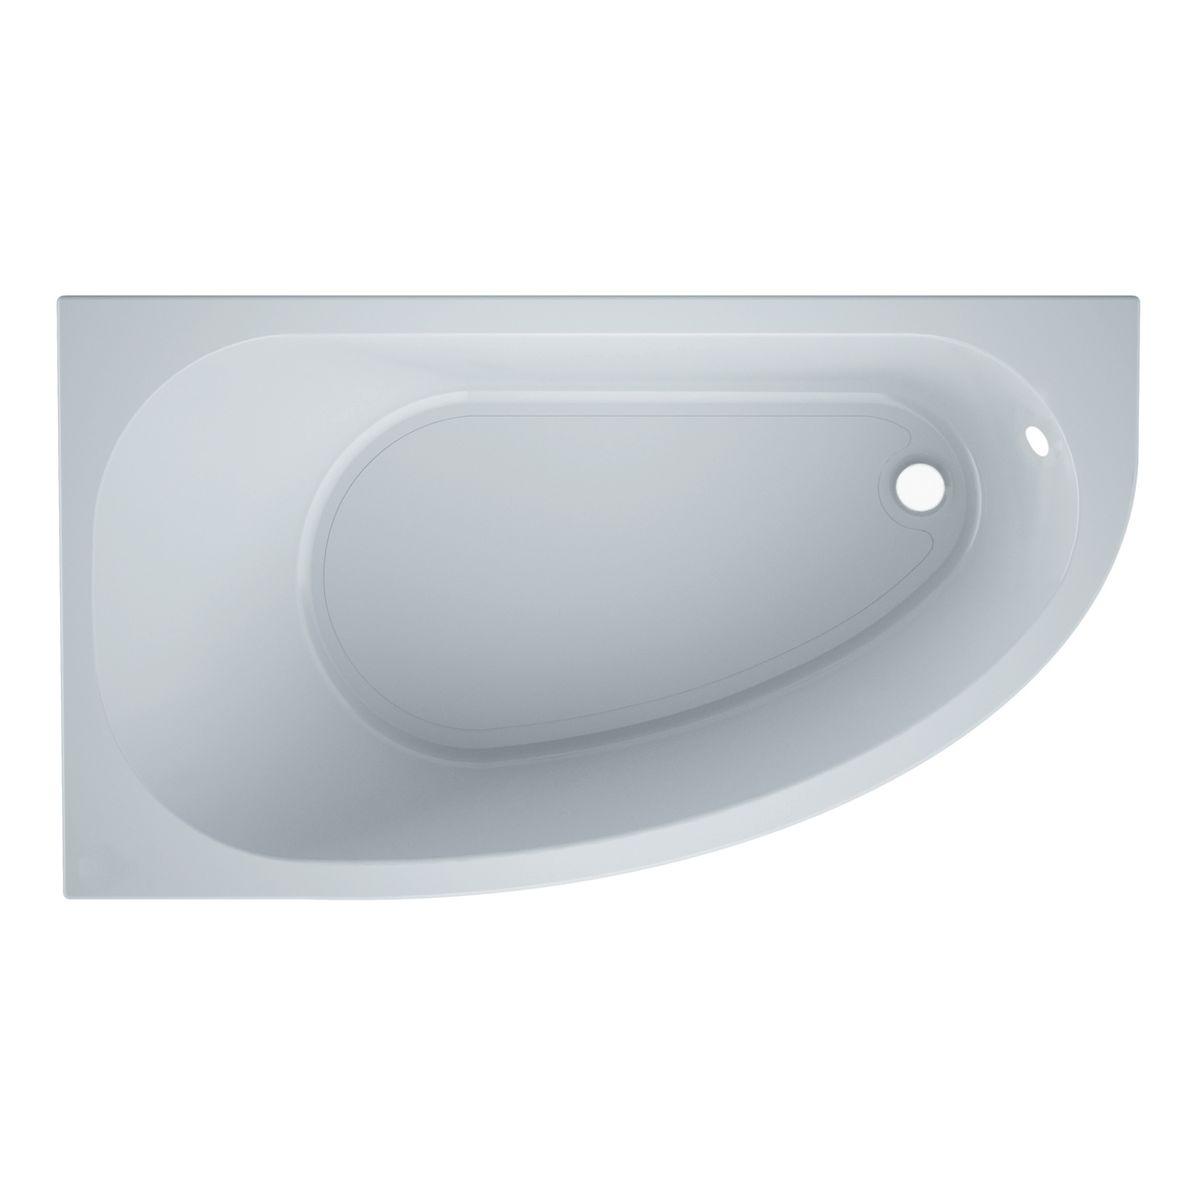 Vasca idromassaggio esterno leroy merlin cs39 for Sdraio leroy merlin prezzi